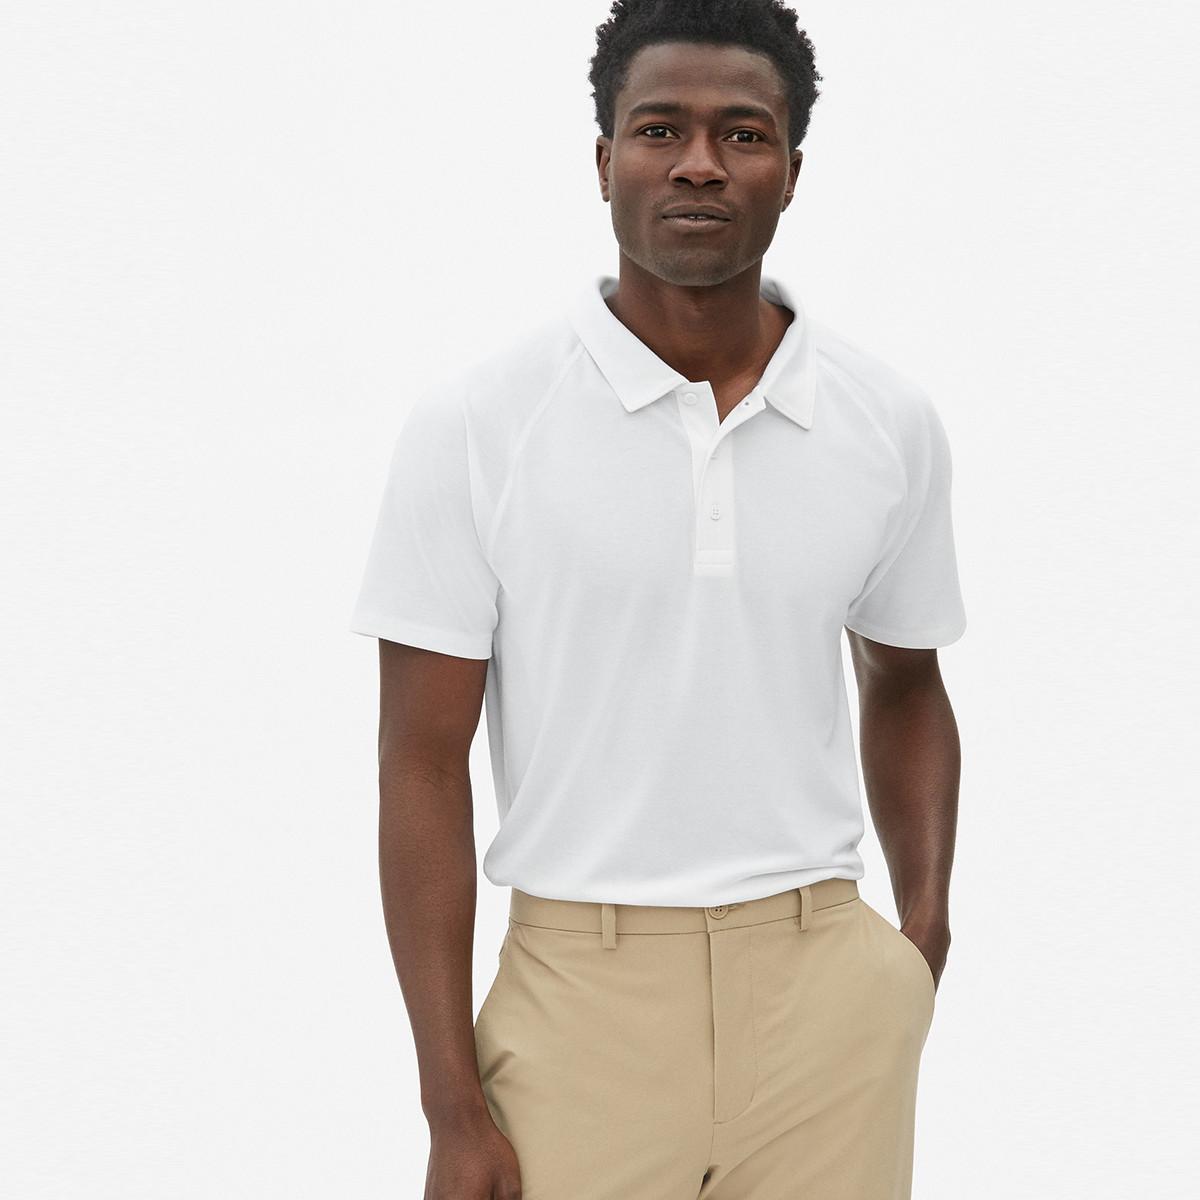 Gap 盖璞 Fit系列 457010 男装Polo衫